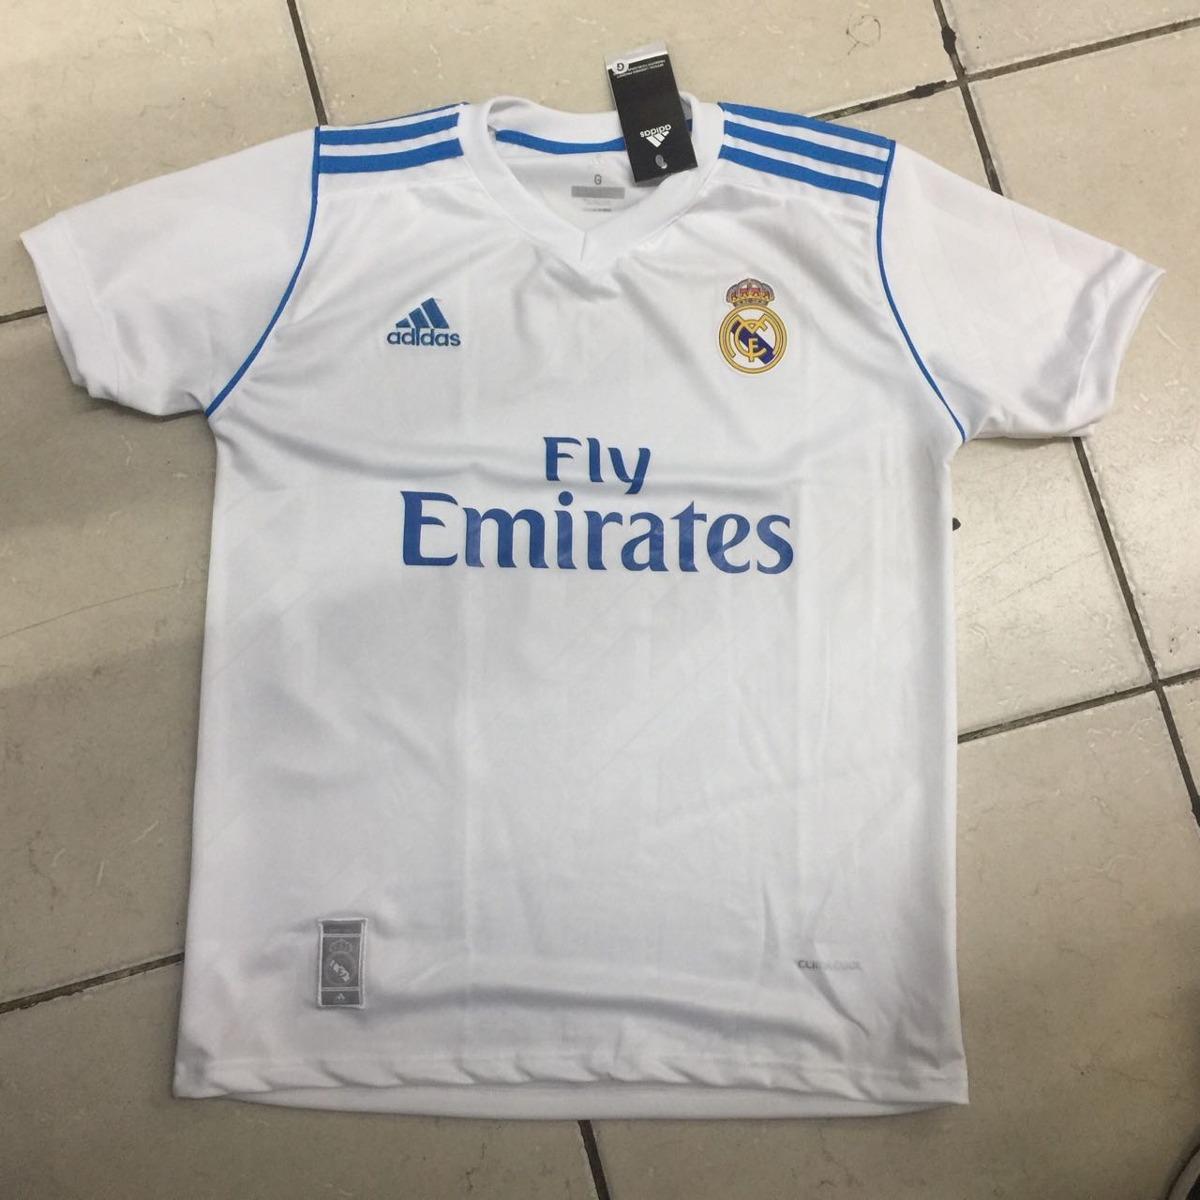 6ae82edc2fc Nova Camisa adidas Real Madrid 2018 Original - R  75